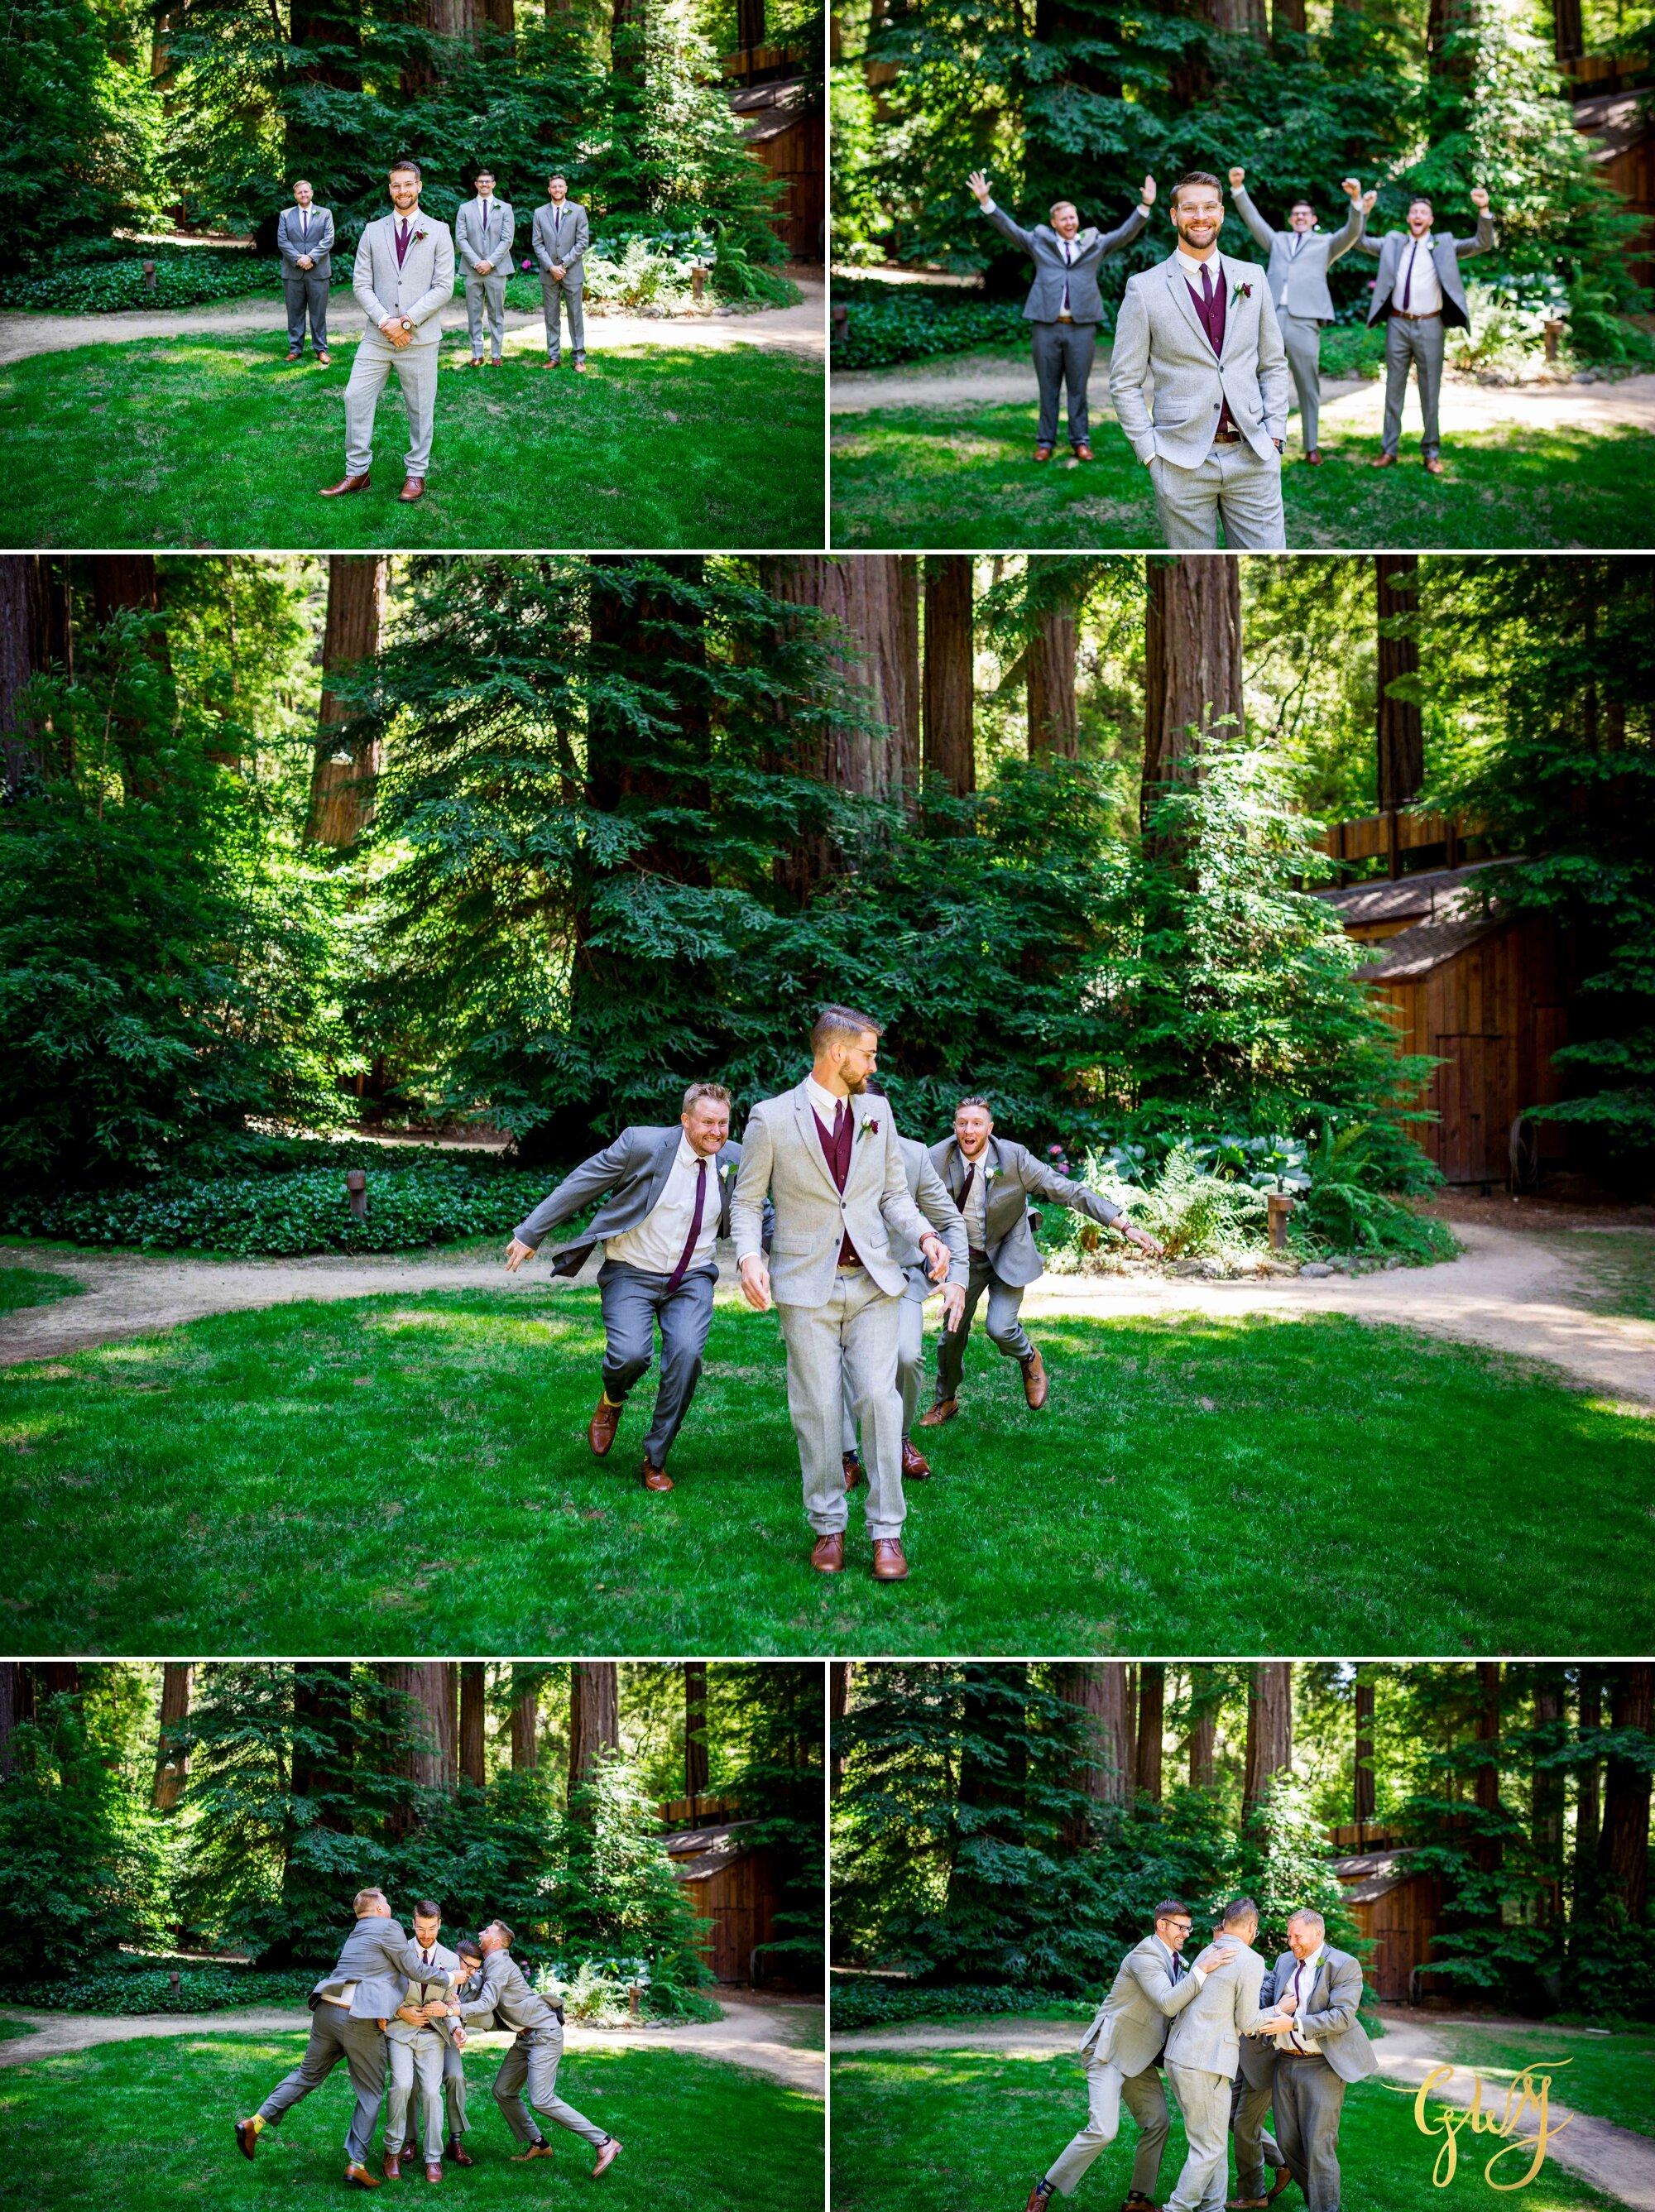 Casey + Jordan's Intimate Big Sur Elopement in the Redwoods by Glass Woods Media 28.jpg